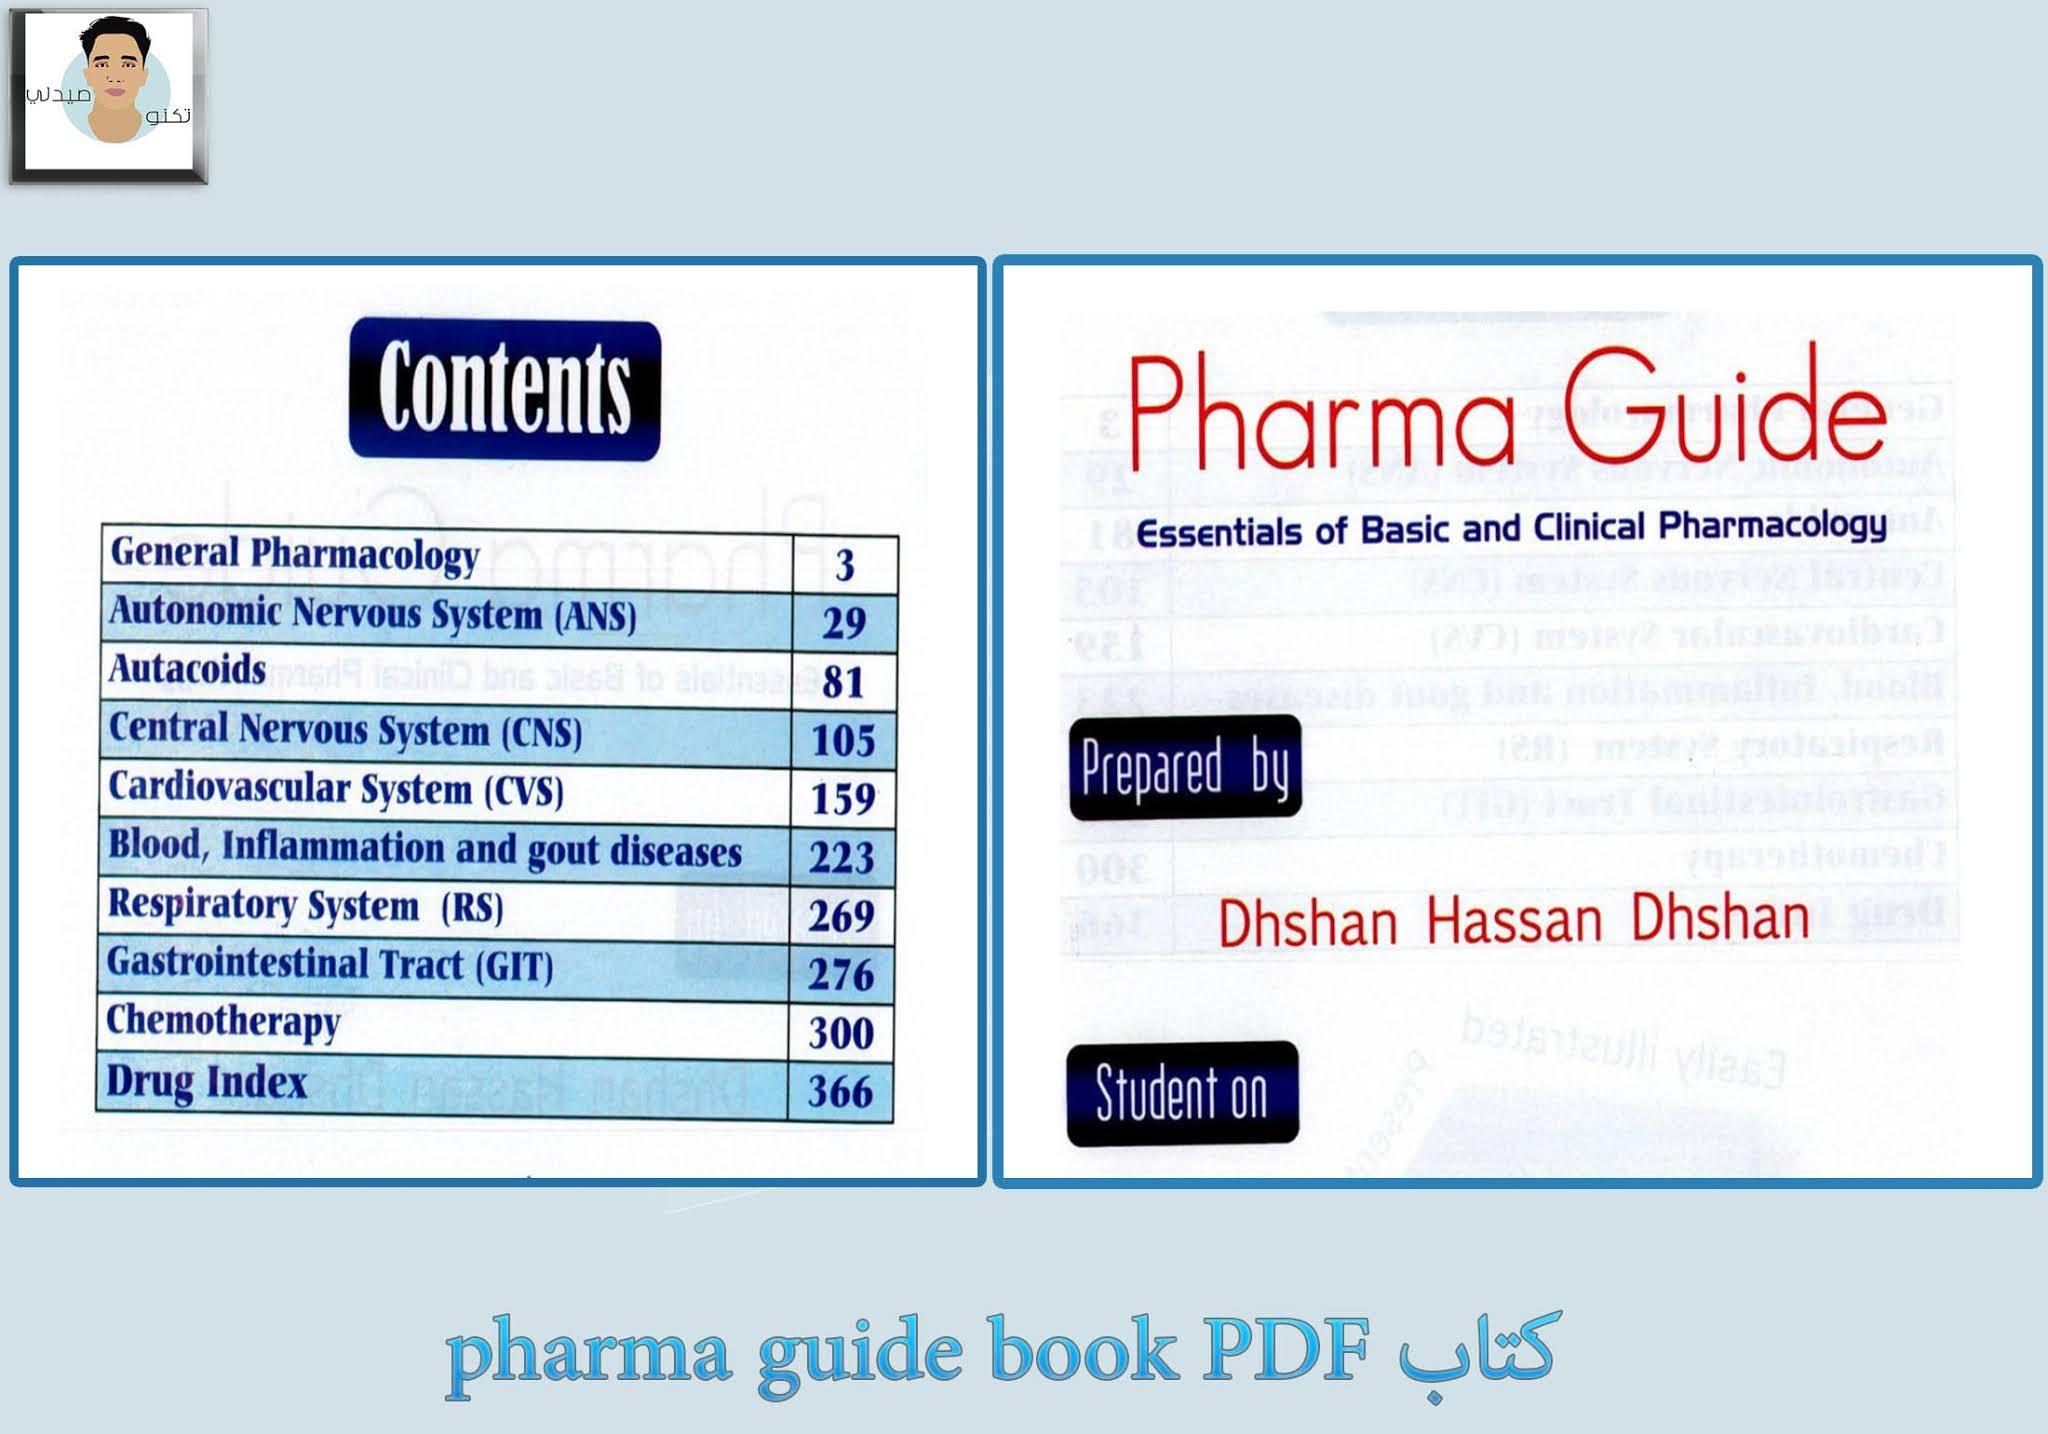 كتاب pharma guide book PDF